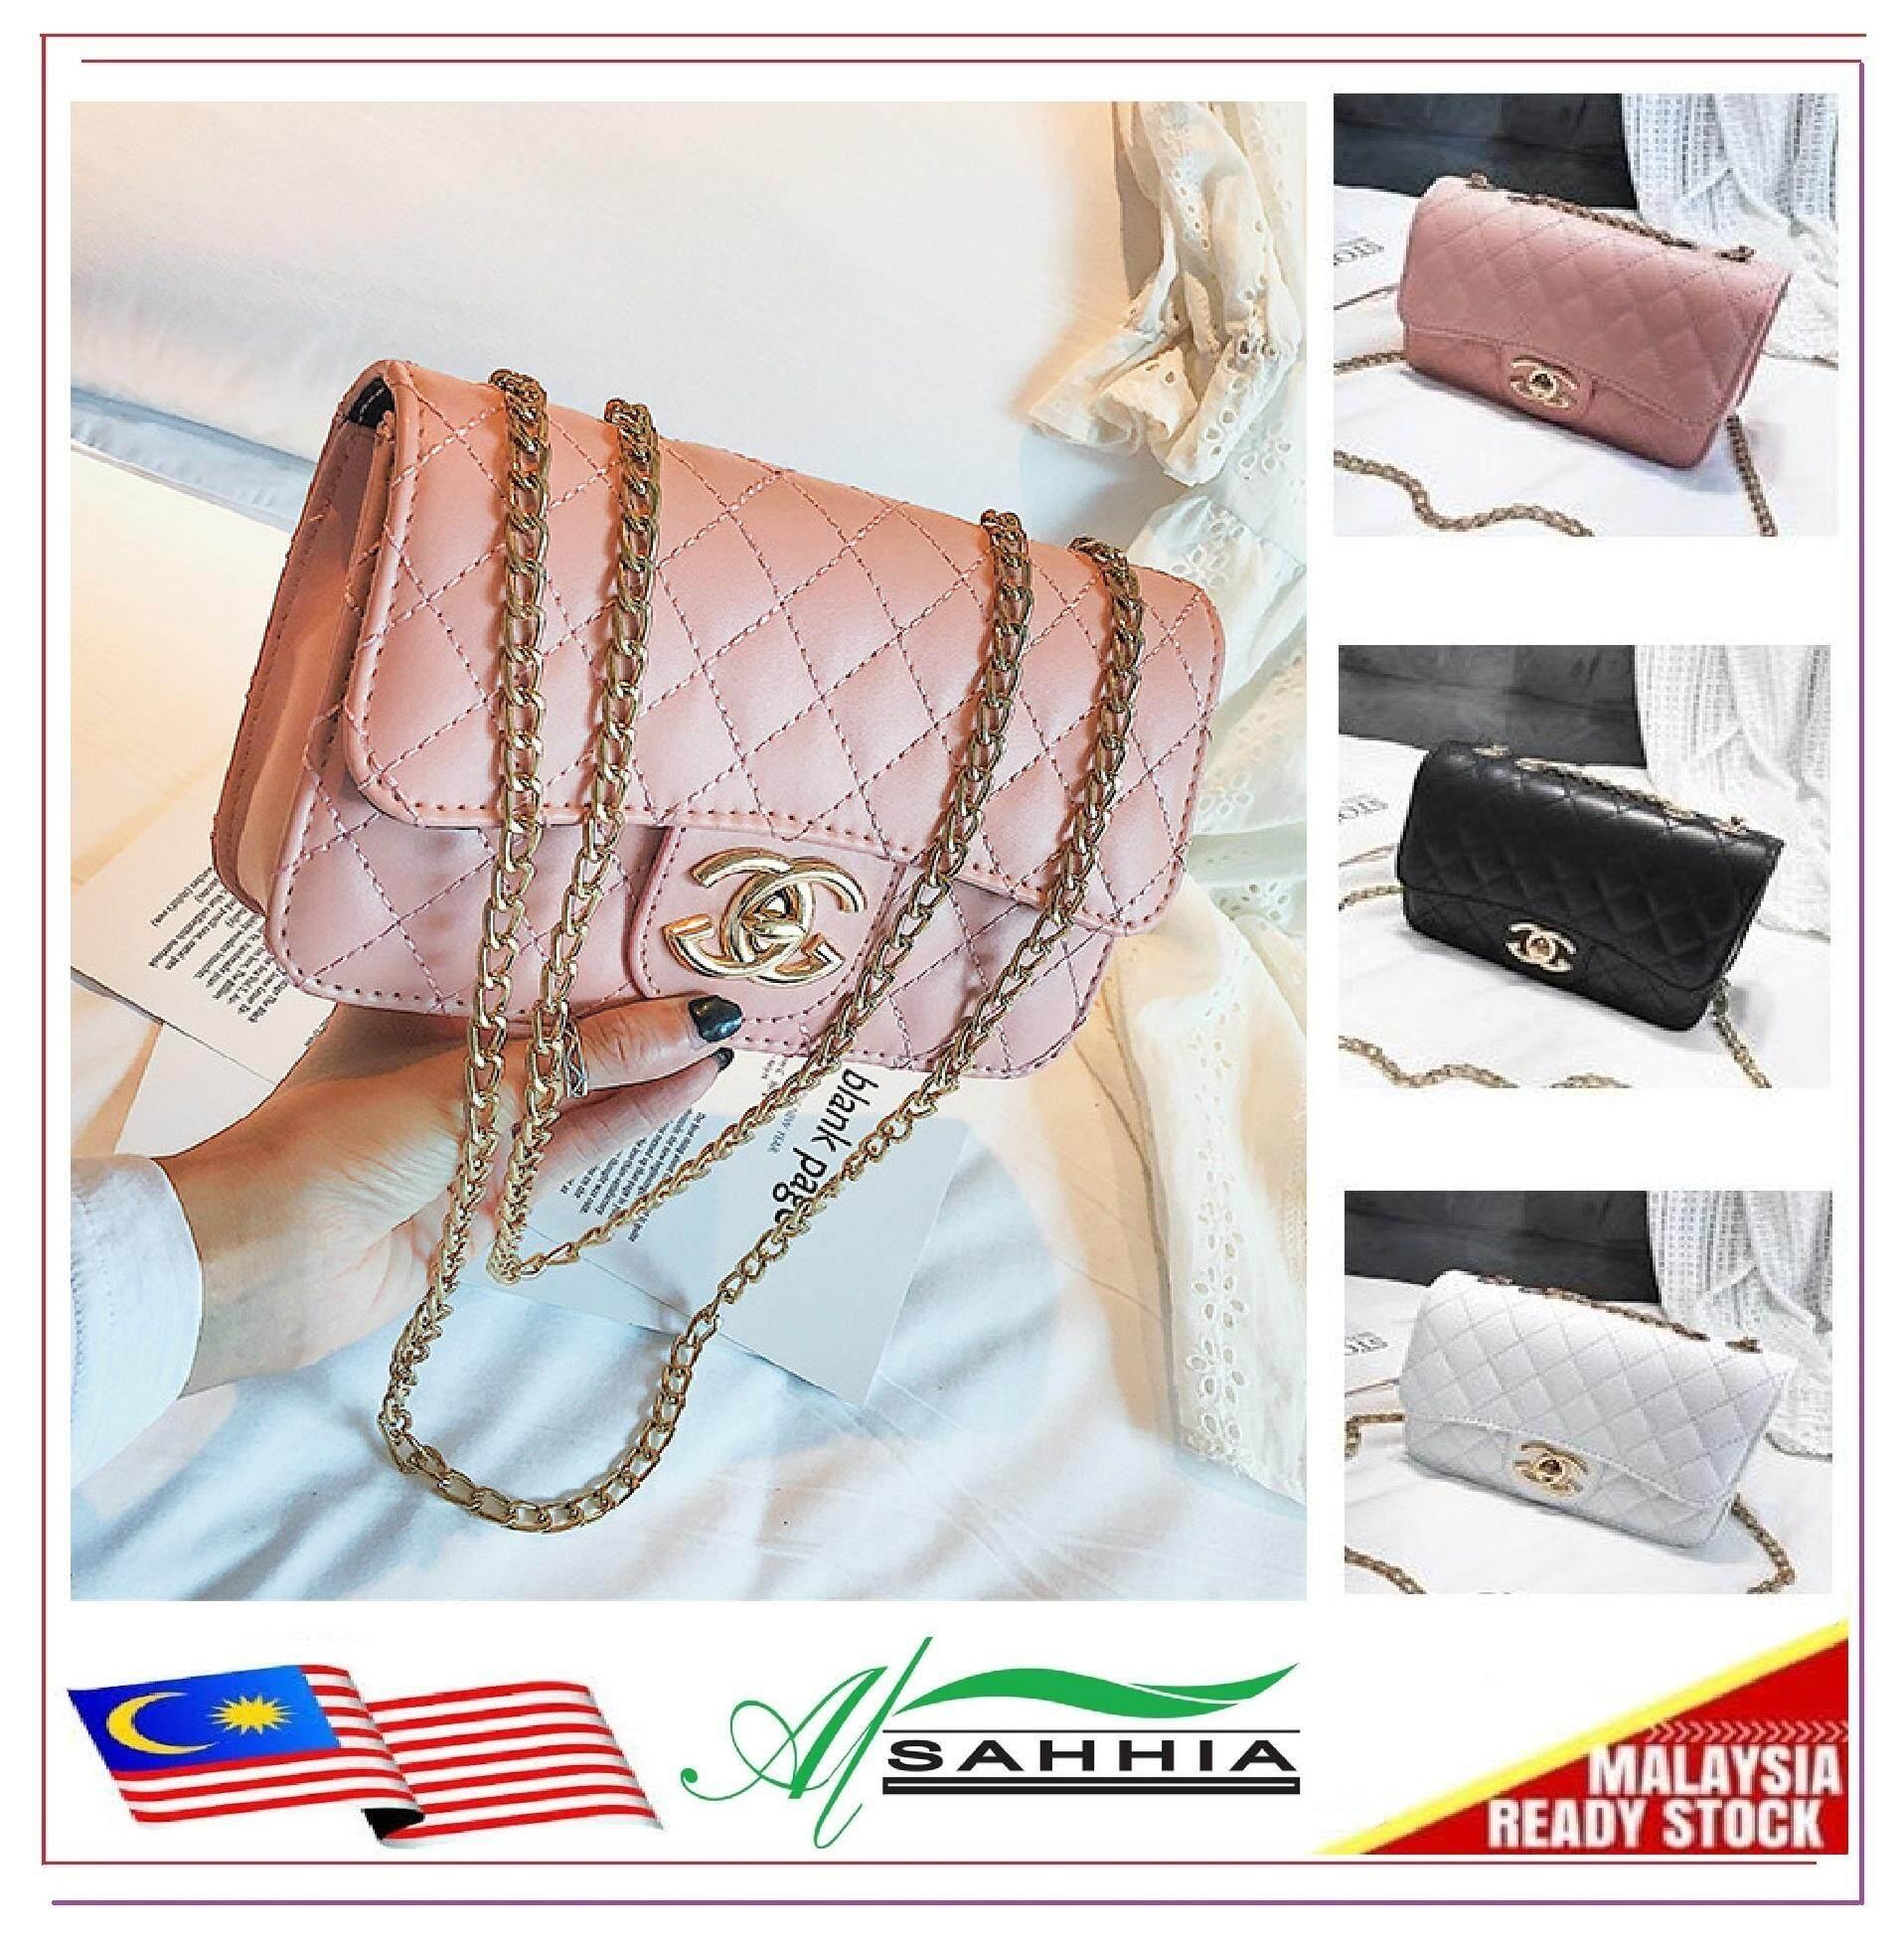 d012fa3e7fba Latest Women s Bags Only on Lazada Malaysia!